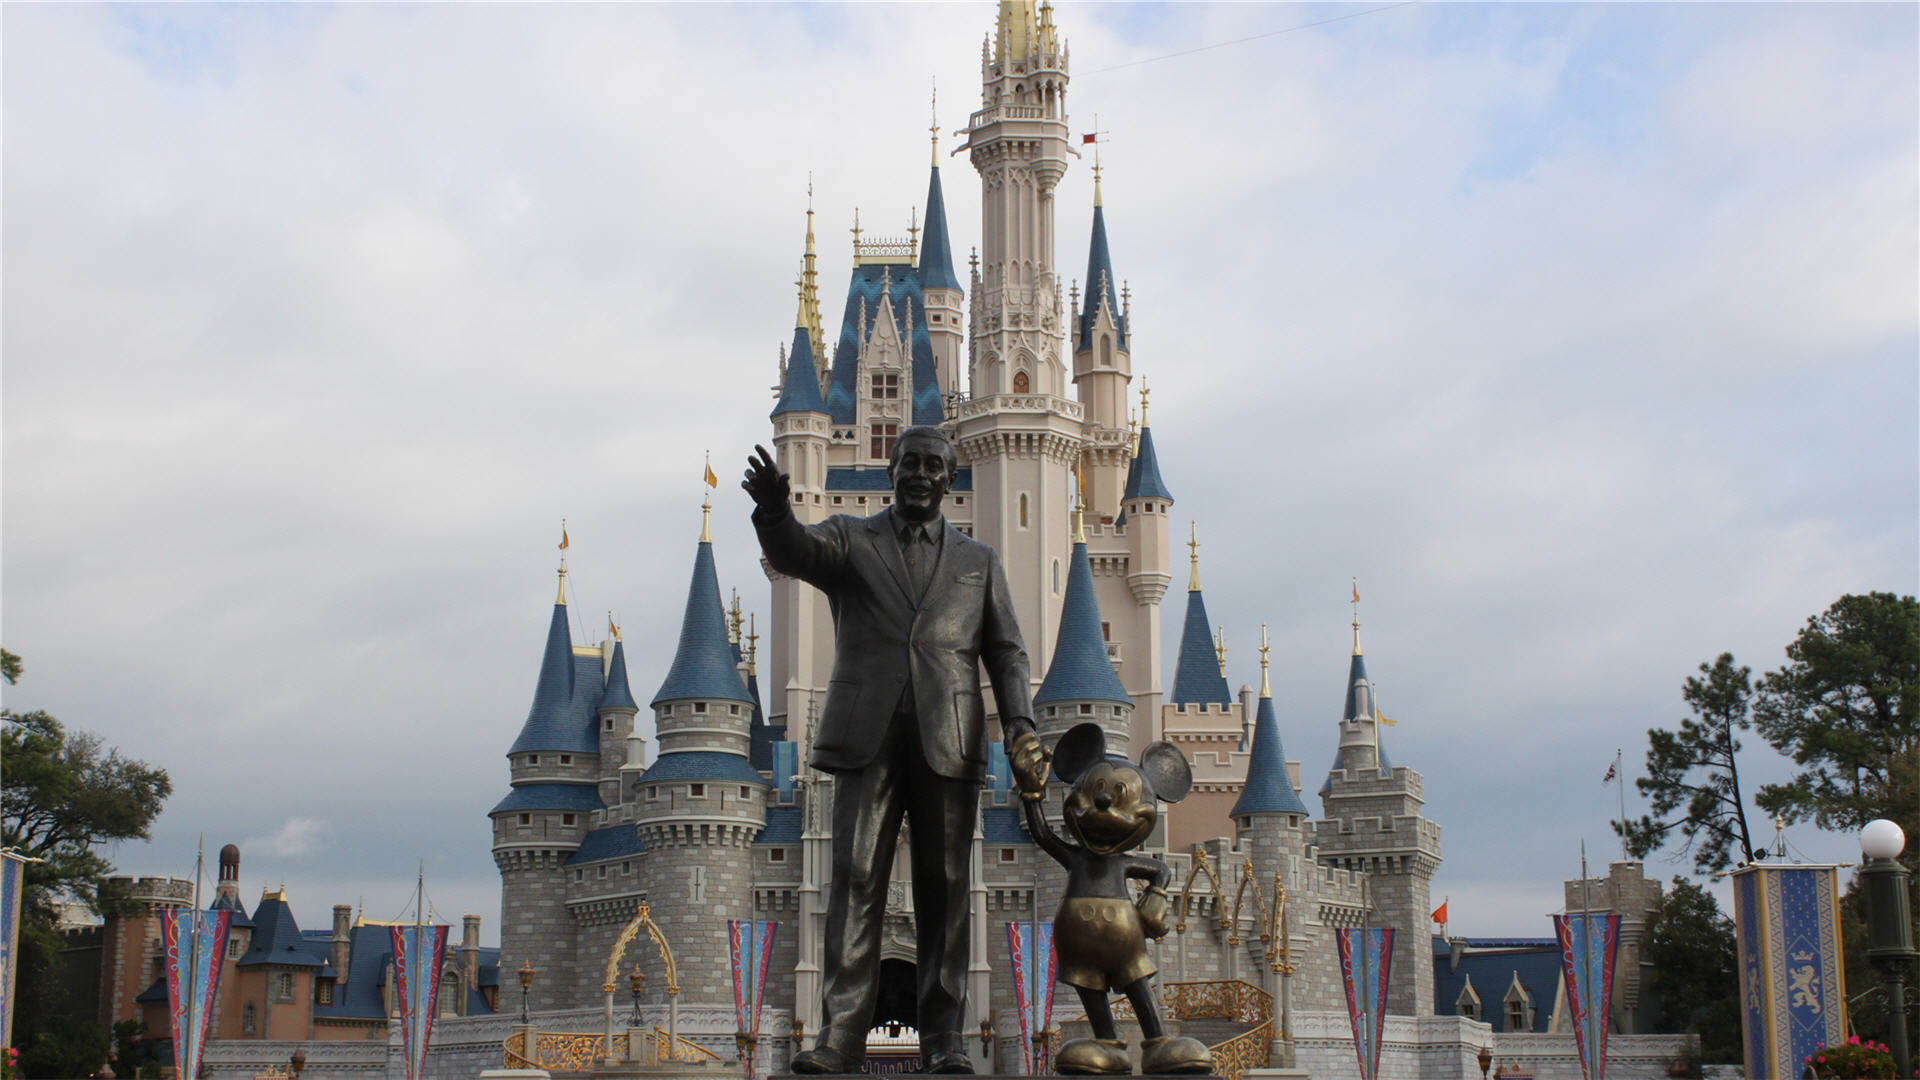 Walt Disney World Castle Pictures Wallpaper HD 1920x1080 3472 1920x1080